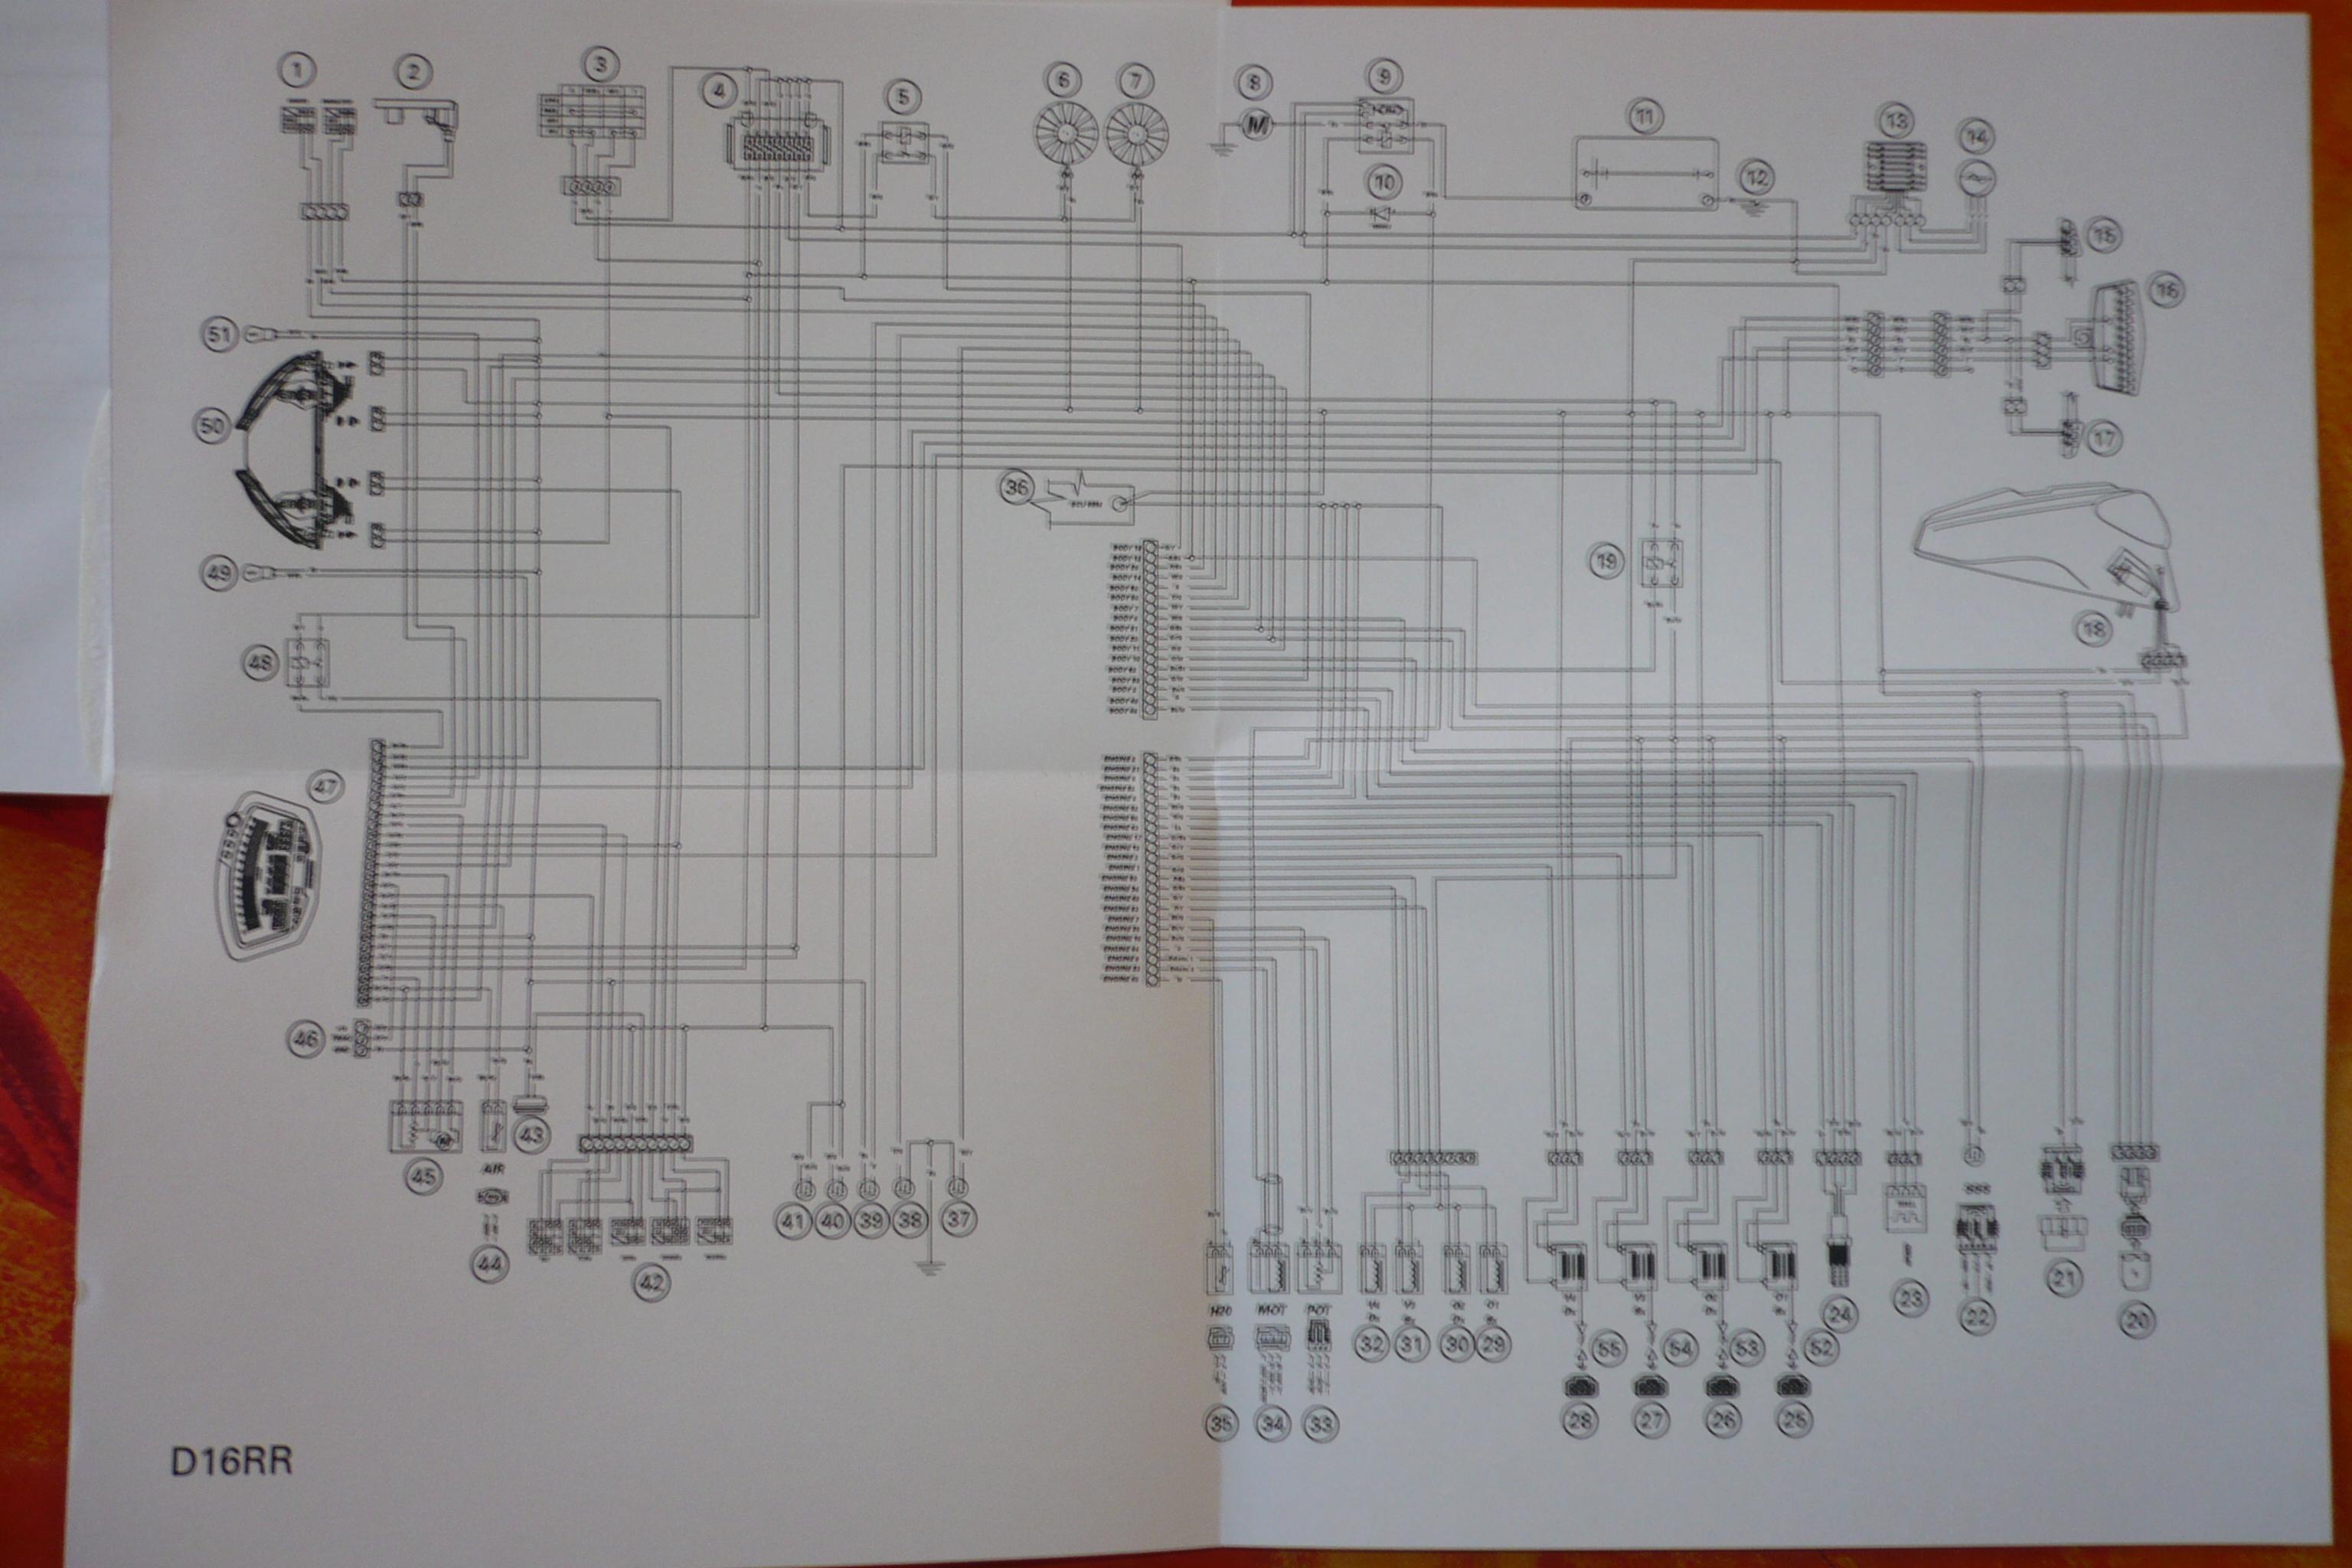 ducati 1098s diagram wiring diagram data rh 6 3 reisen fuer meister de